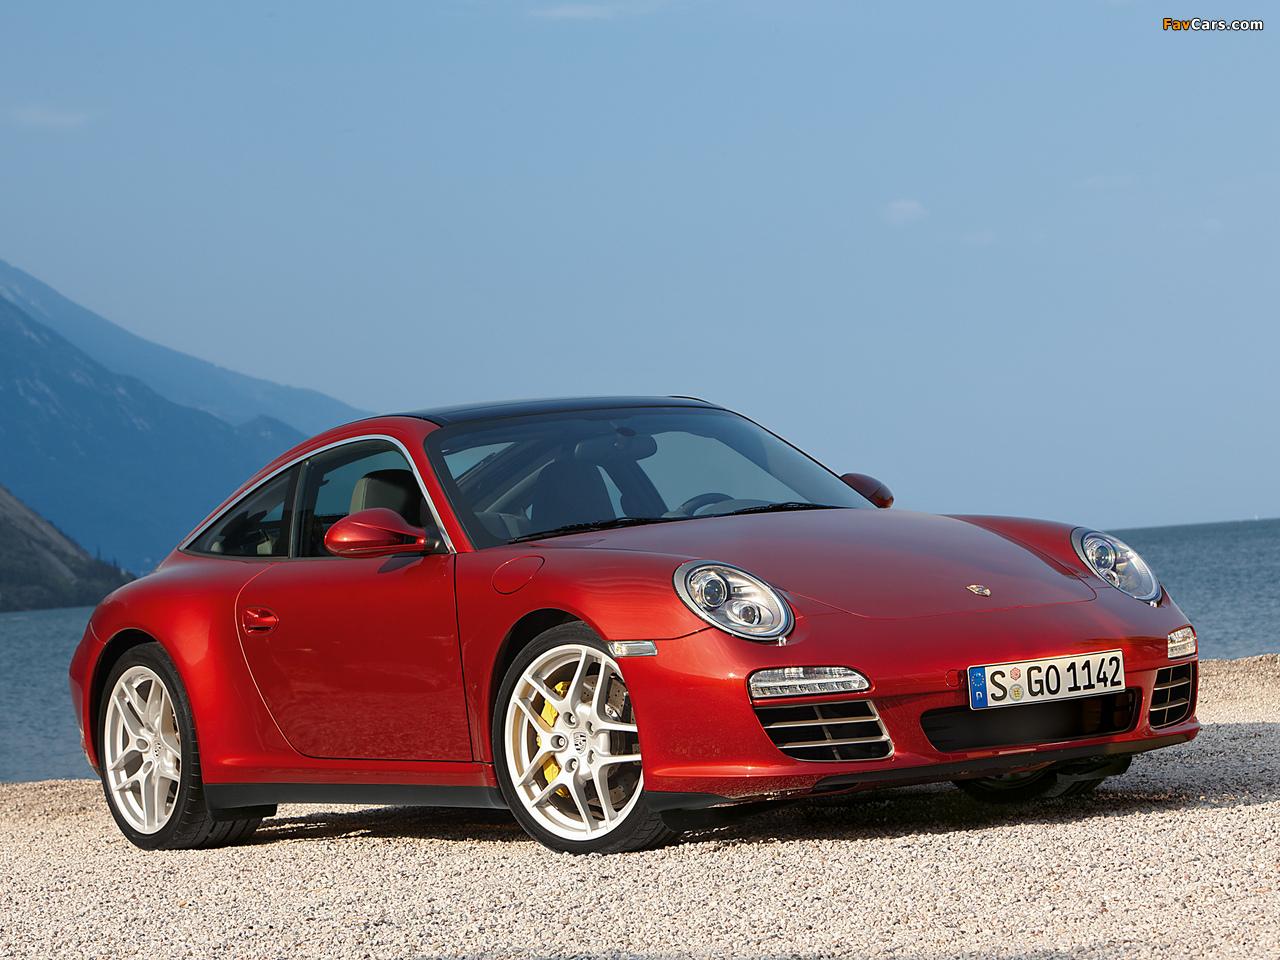 Porsche 911 Targa 4s 997 2008 Pictures 1280x960